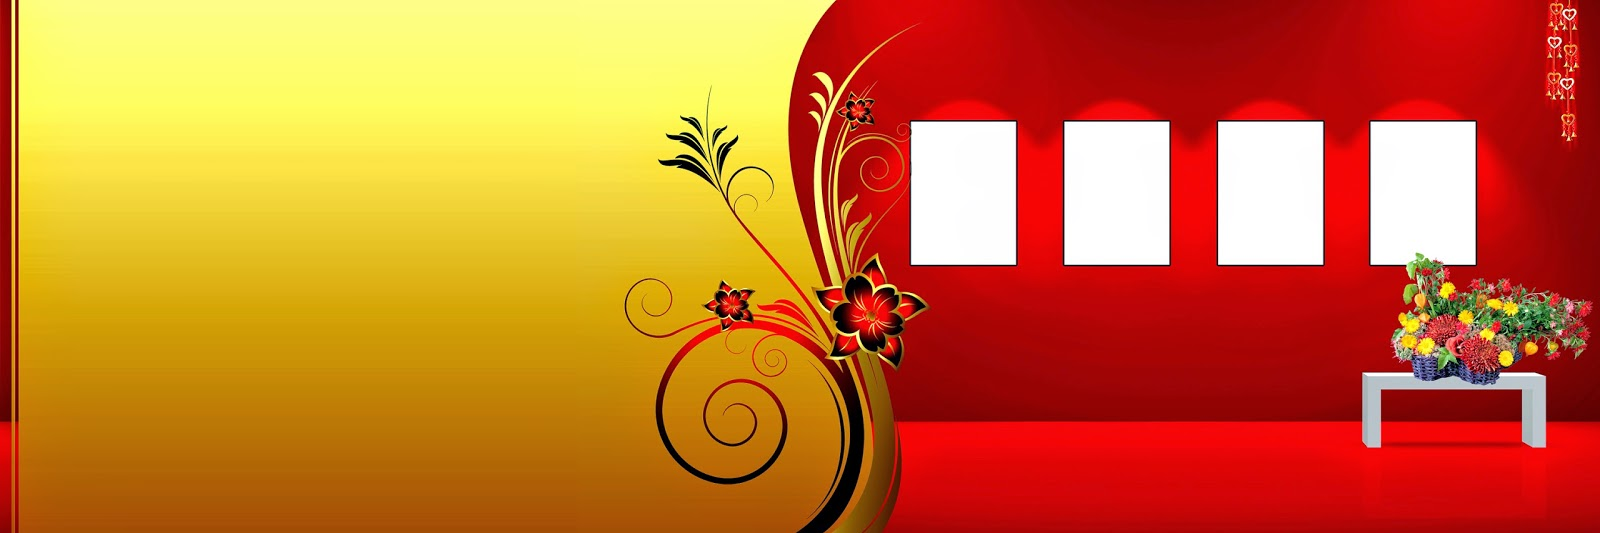 Golden Anniversary Invitations Templates as beautiful invitation layout